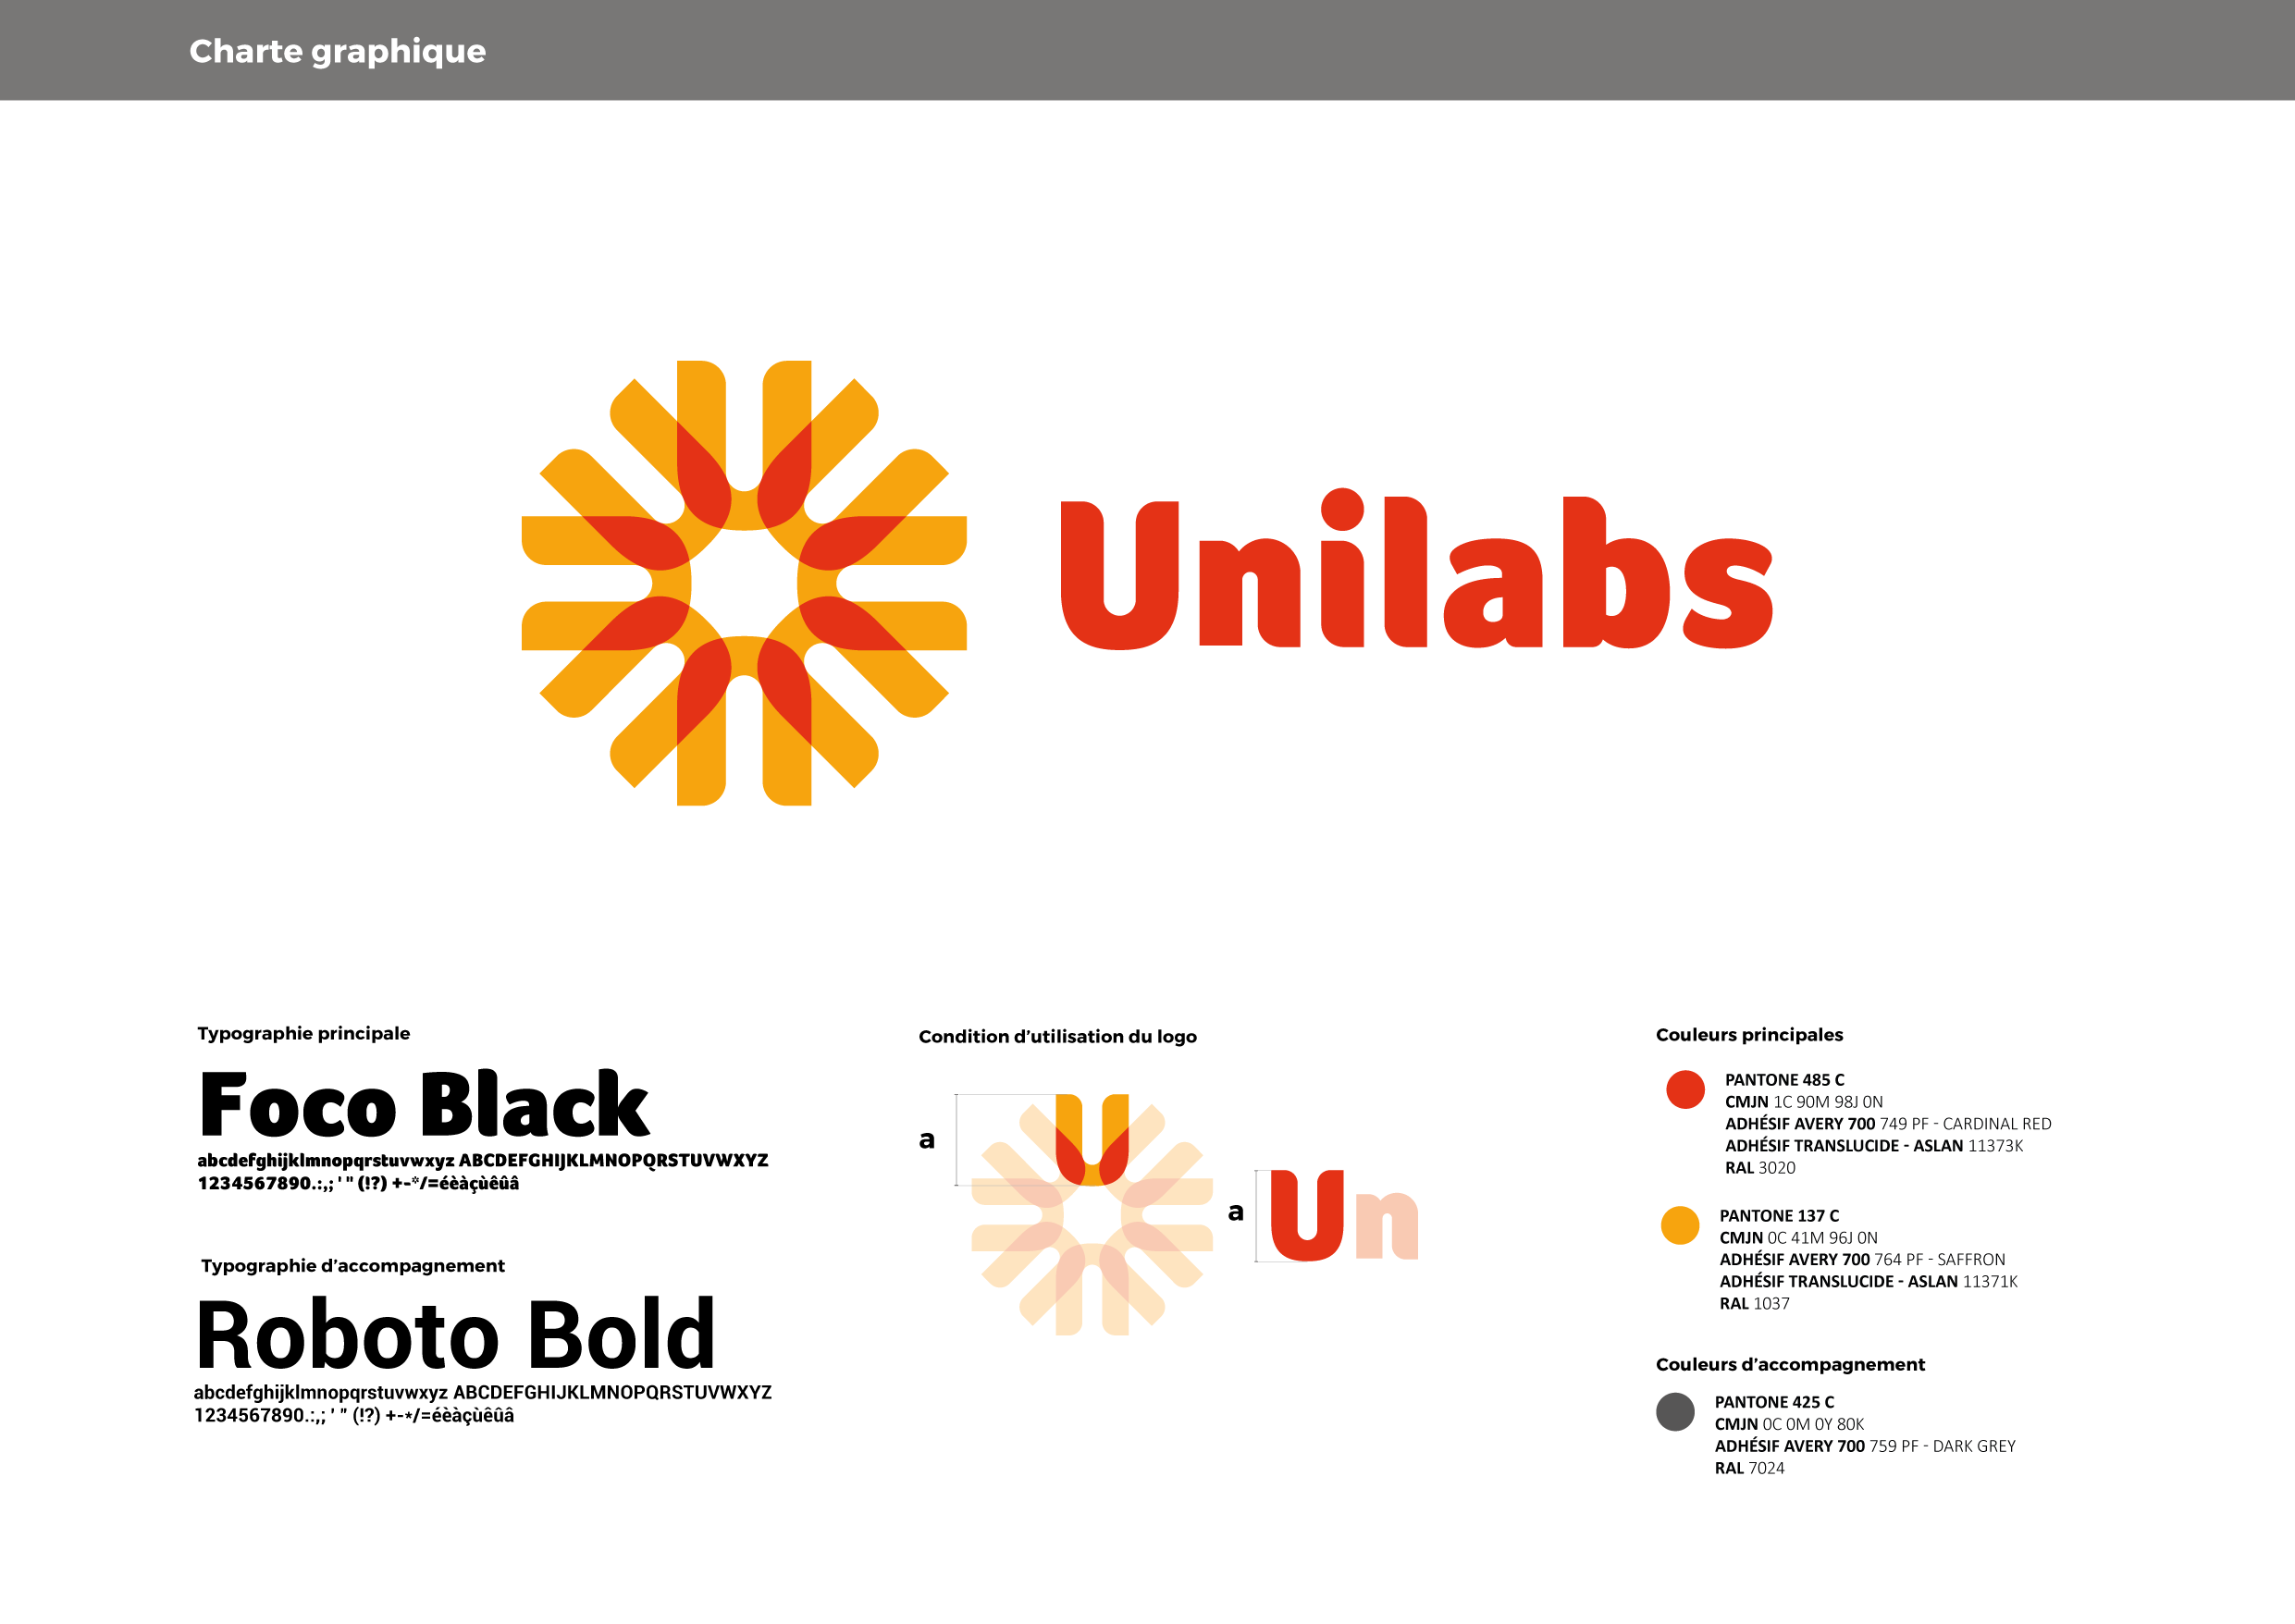 unilabs_Plan de travail 1 copie